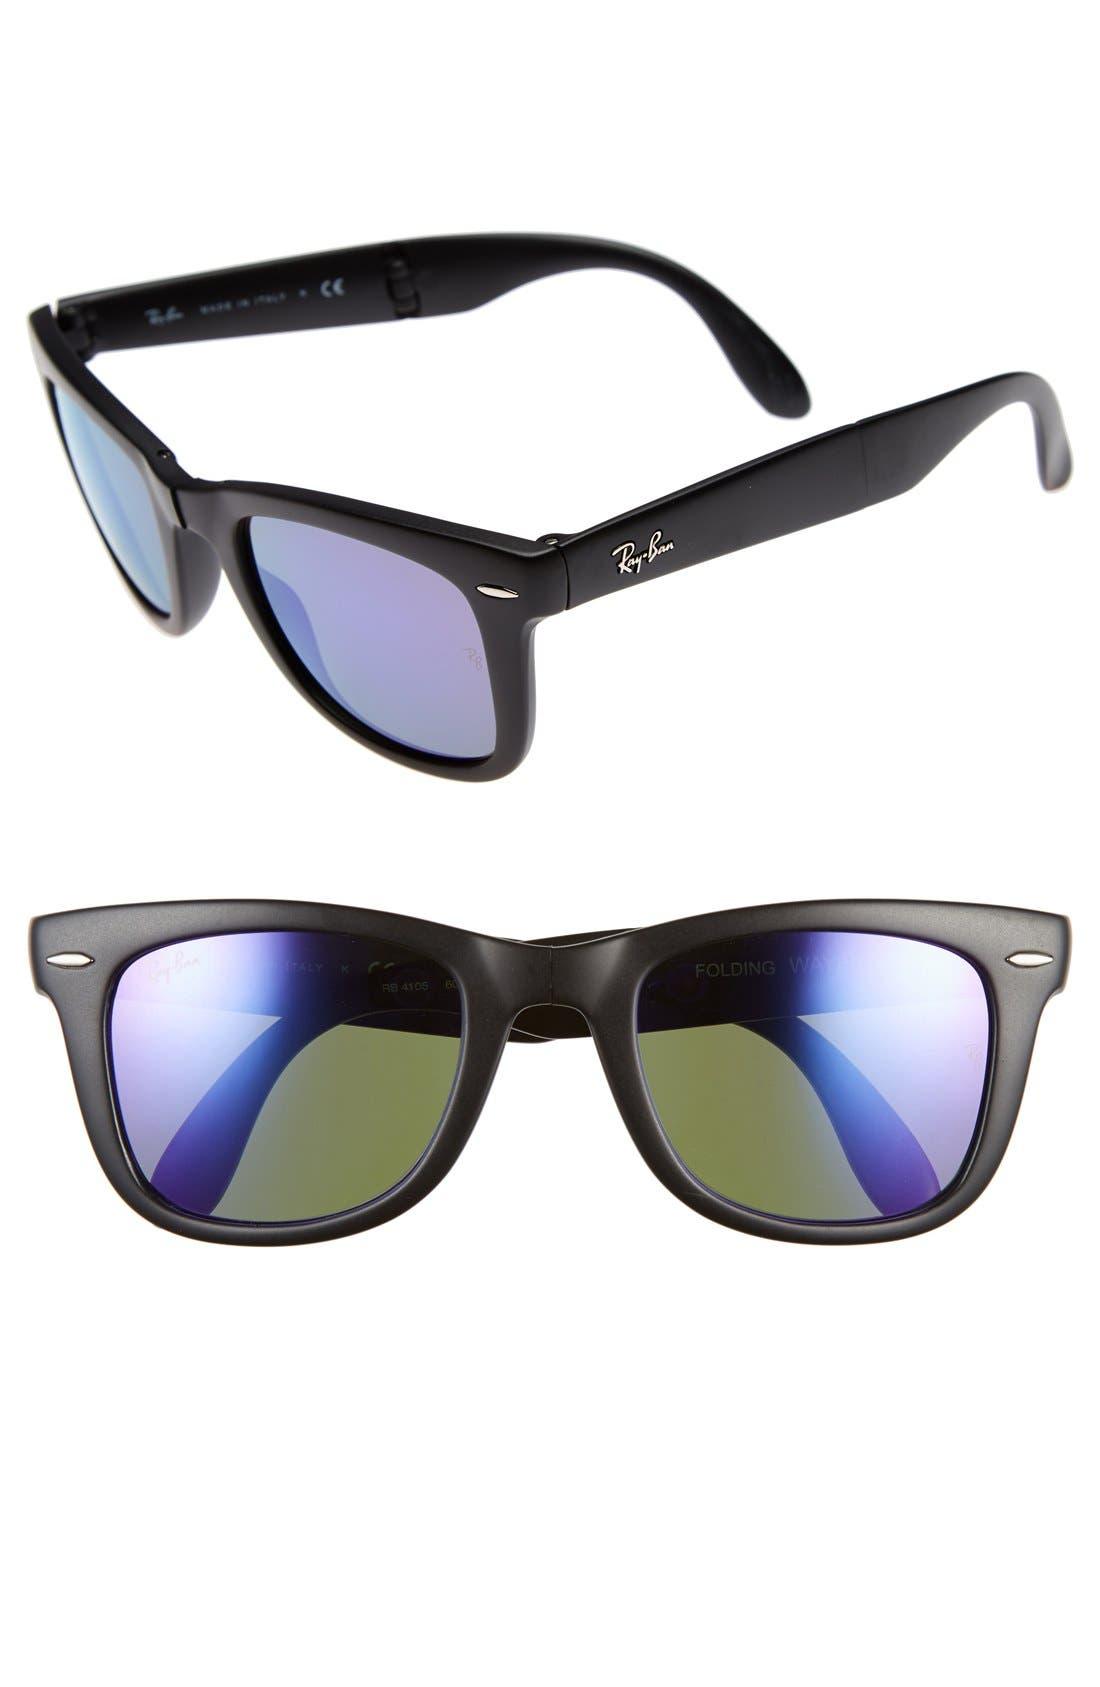 Main Image - Ray-Ban 'Folding Wayfarer' 50mm Sunglasses (Nordstrom Exclusive)